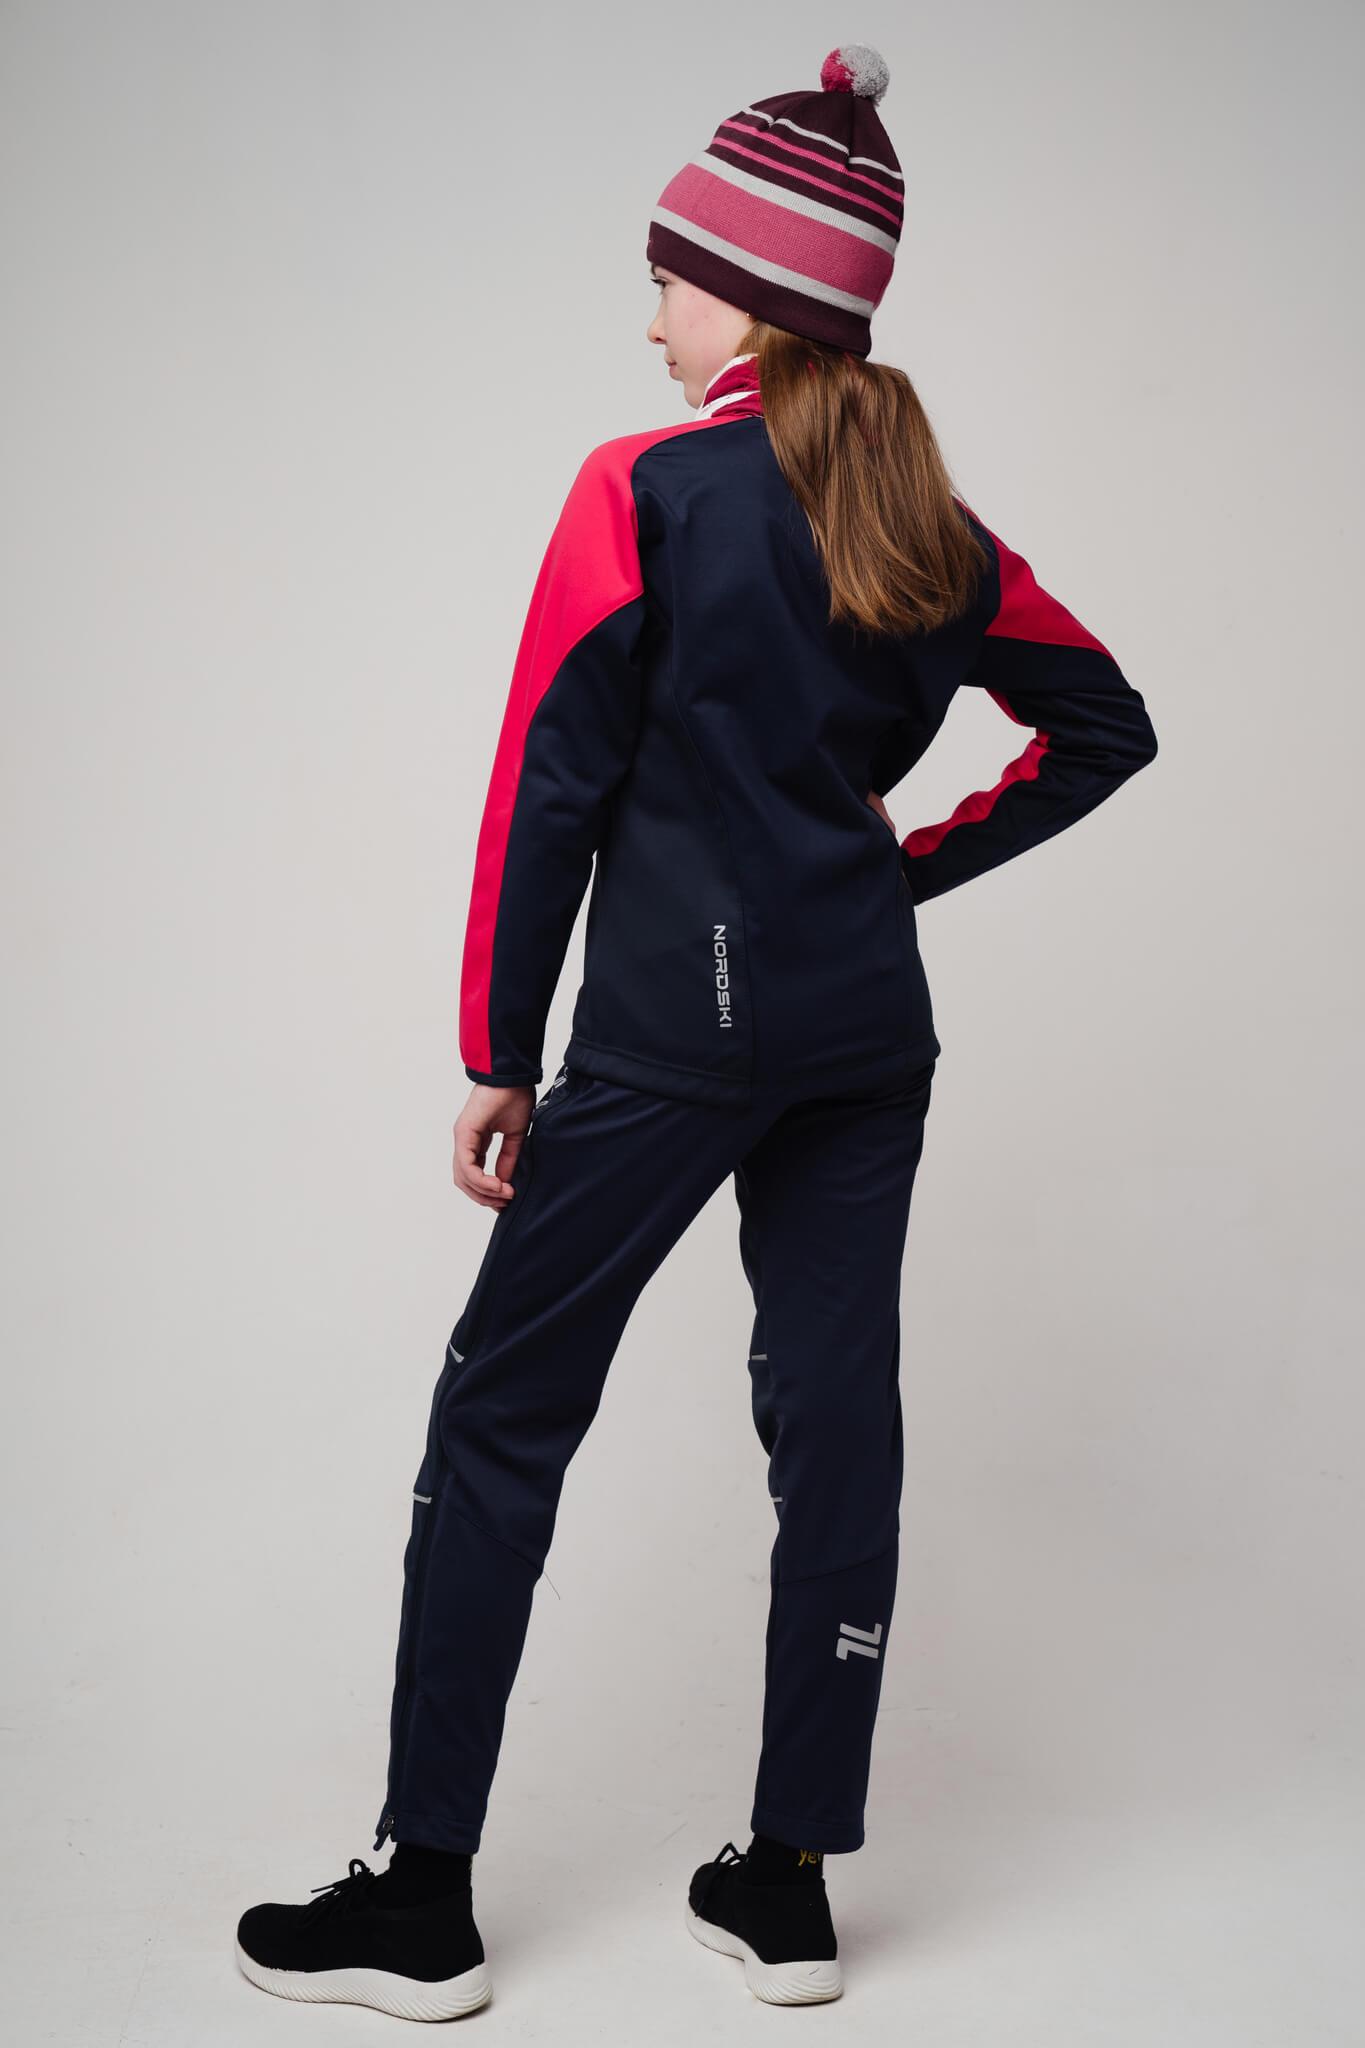 Nordski Jr Premium лыжный костюм детский pink-blueberry - 2